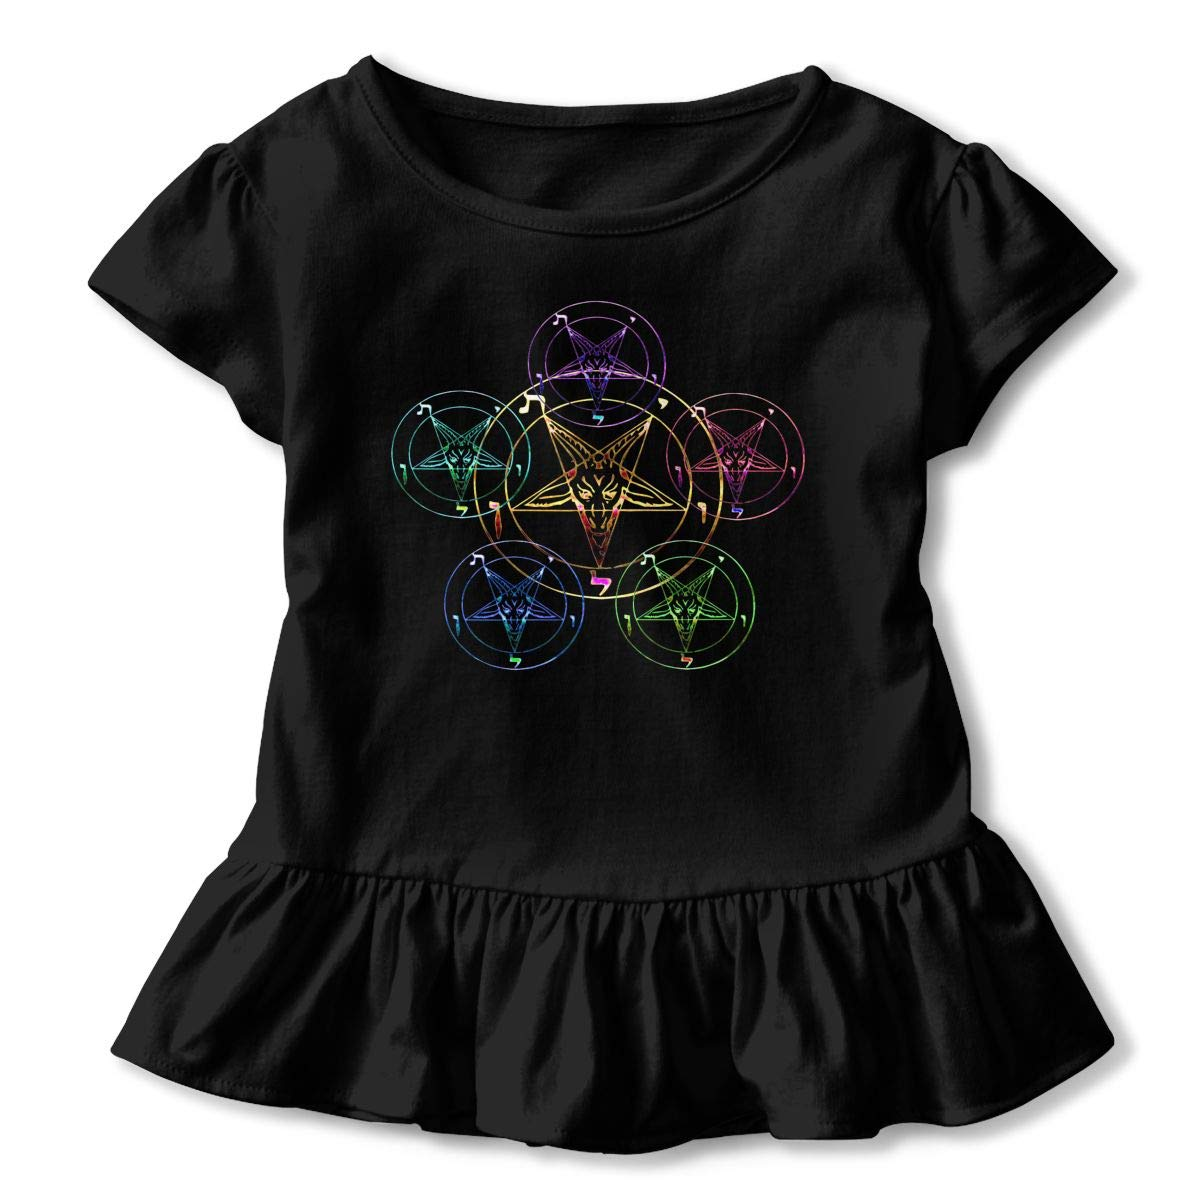 Clarissa Bertha Colorful Baphomet Satanic Goat Toddler Baby Girls Short Sleeve Ruffle T-Shirt